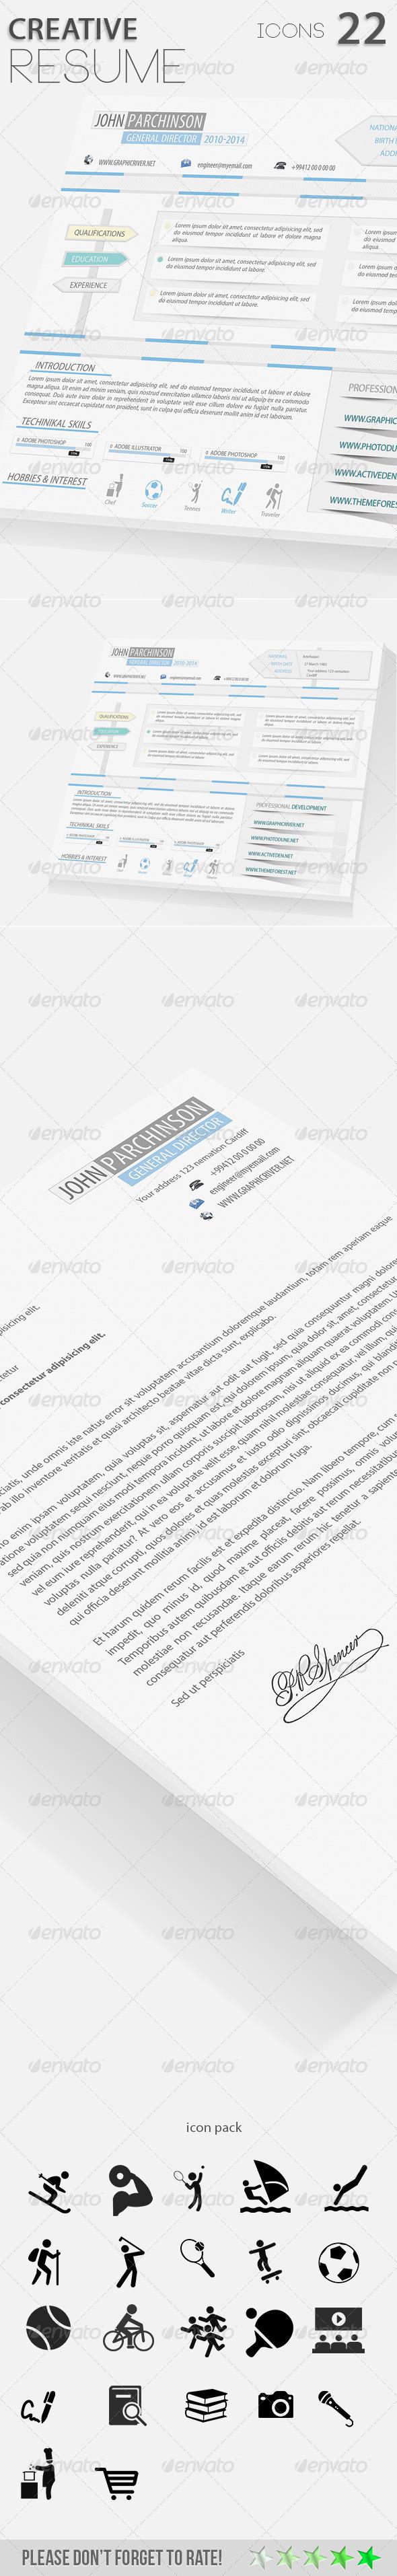 GraphicRiver Creative Resume 01 6730266